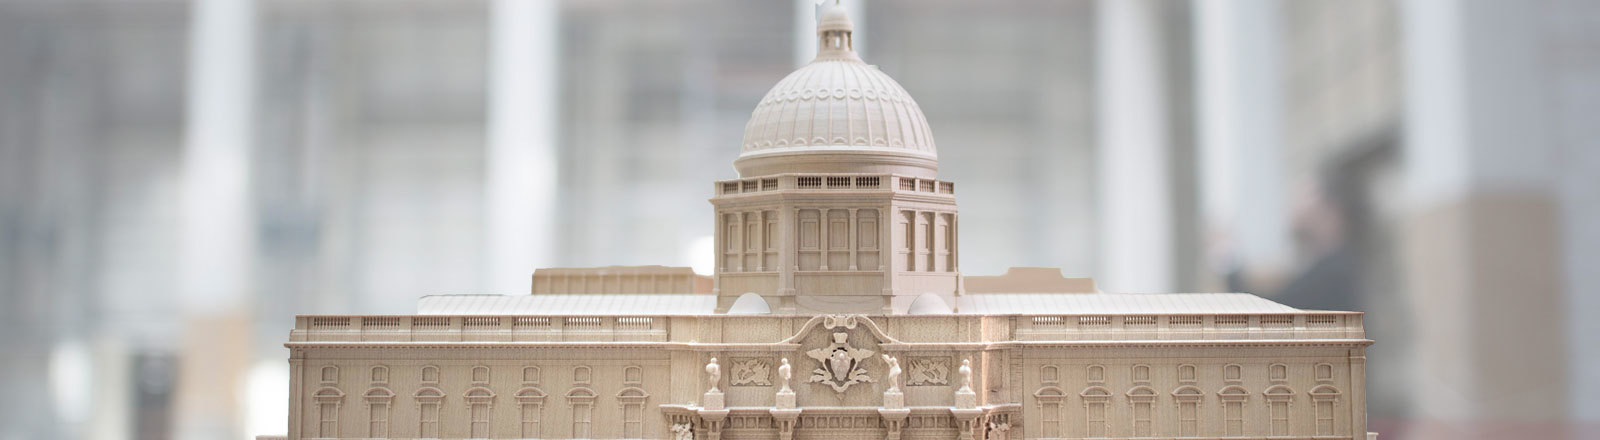 Modell des Berliner Schlosses